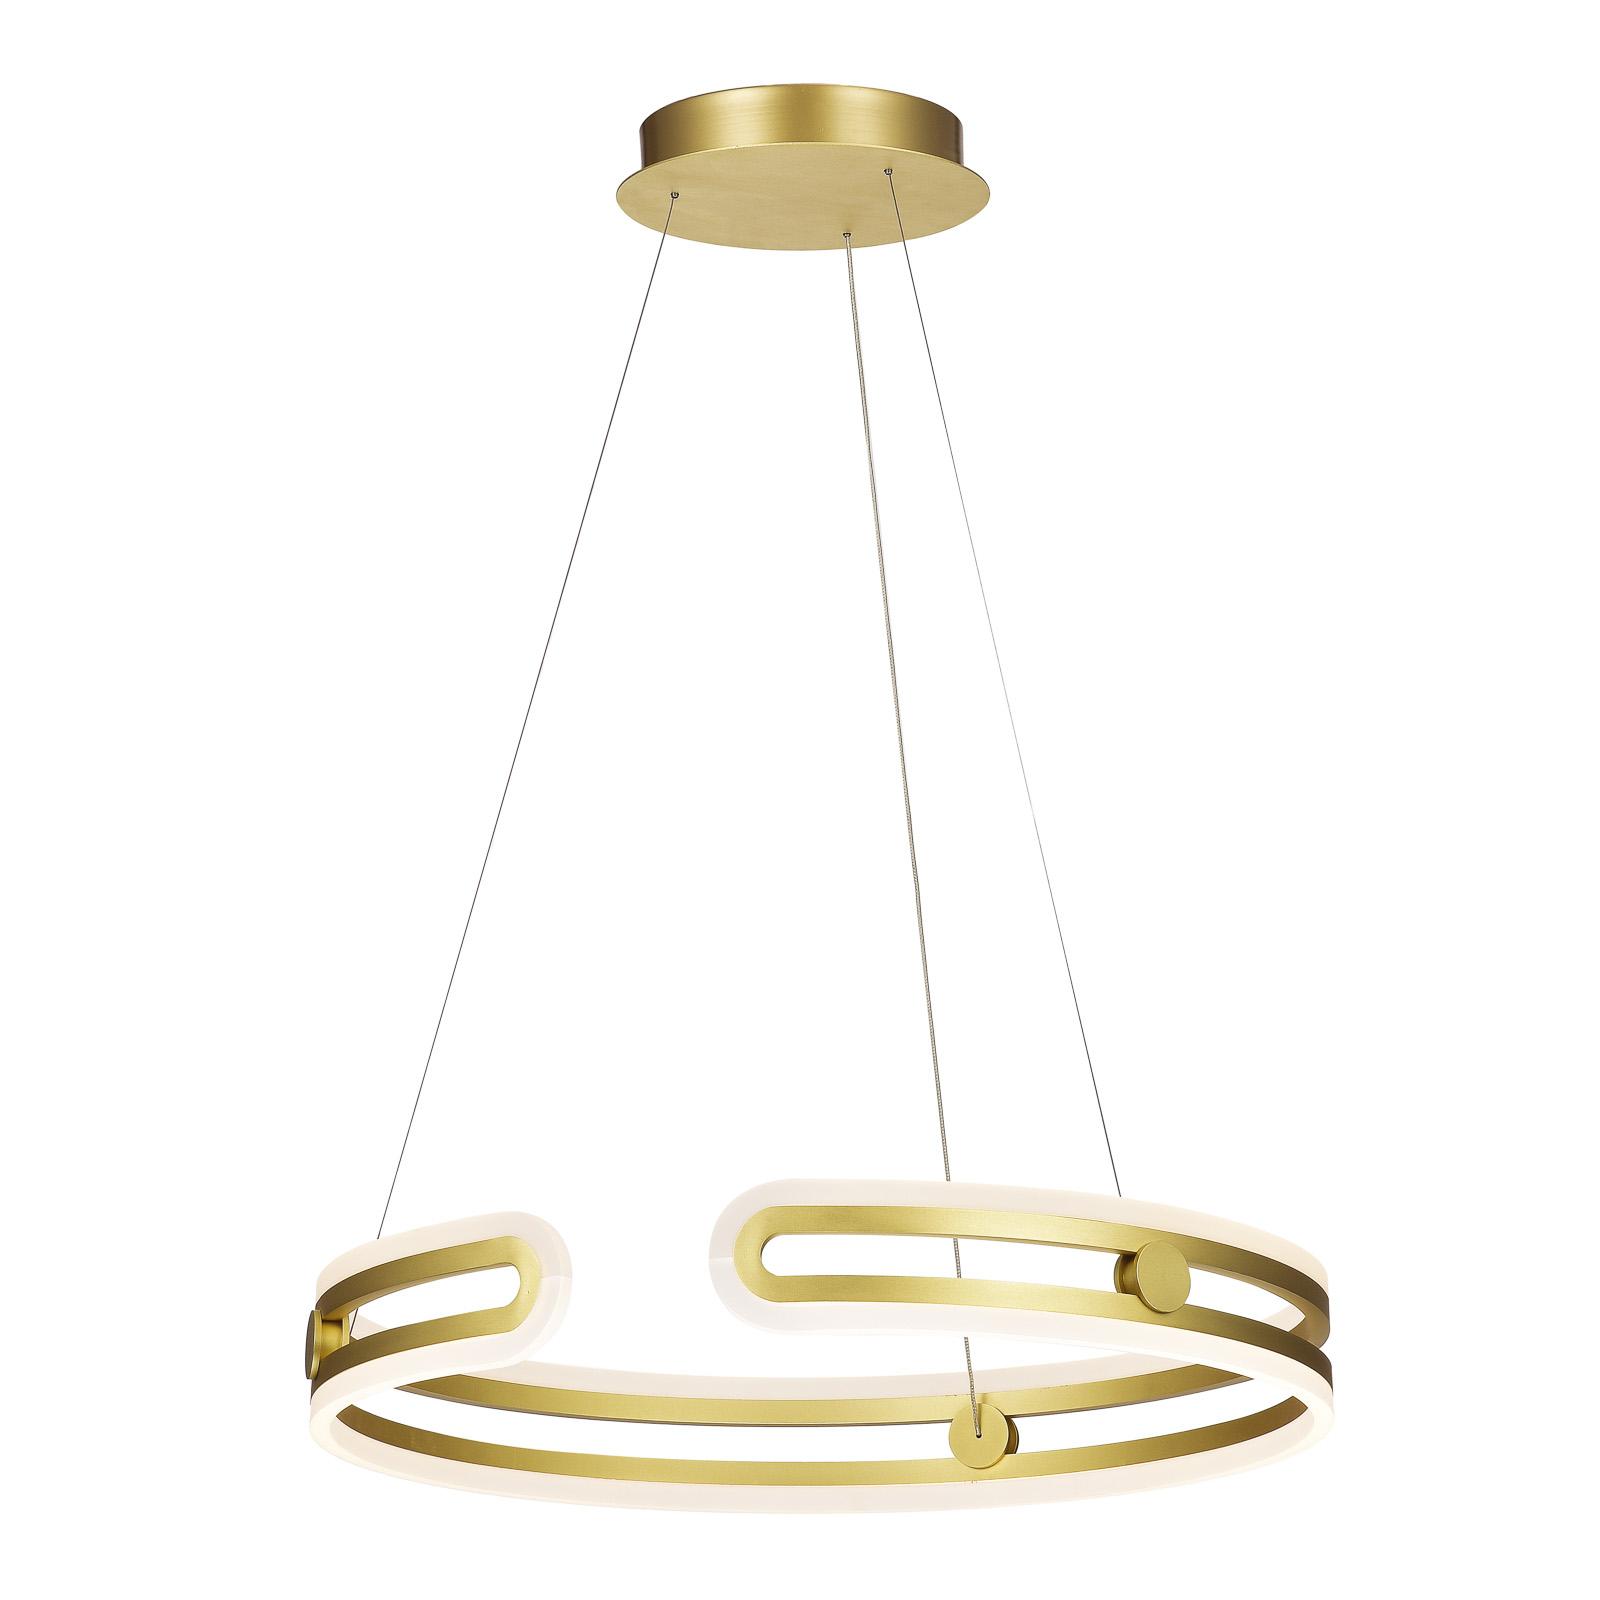 Kiara MD17016002 1E GOLD nowoczesna lampa wisząca LED Italux